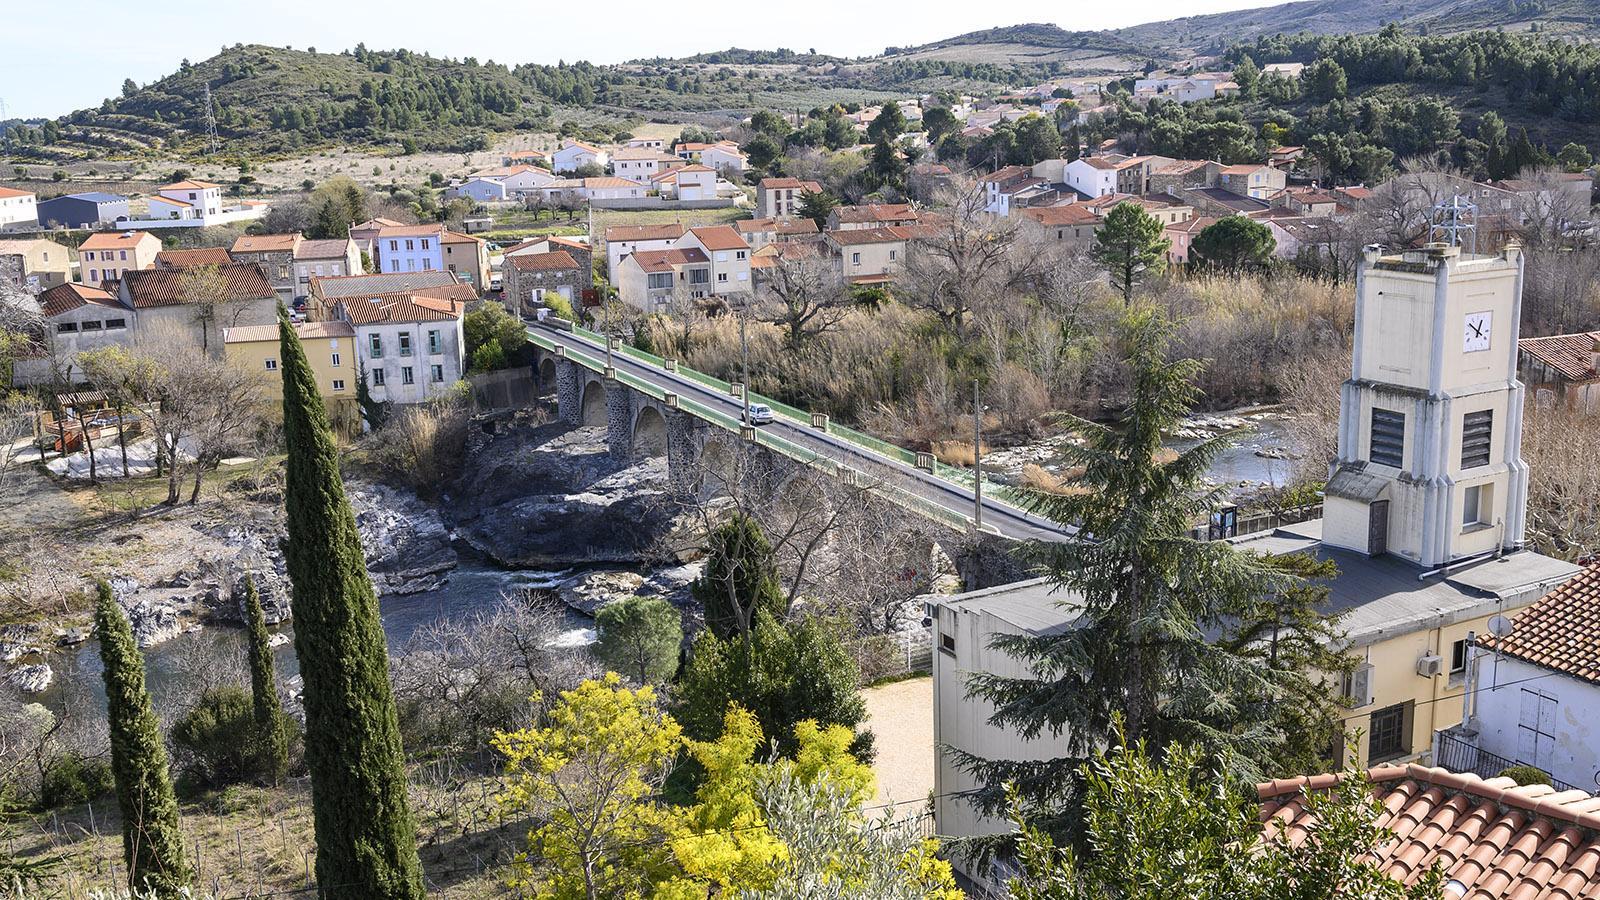 Cases-de-Pene, Blick vom Belvedere gen Süden. Foto: Hilke Maunder